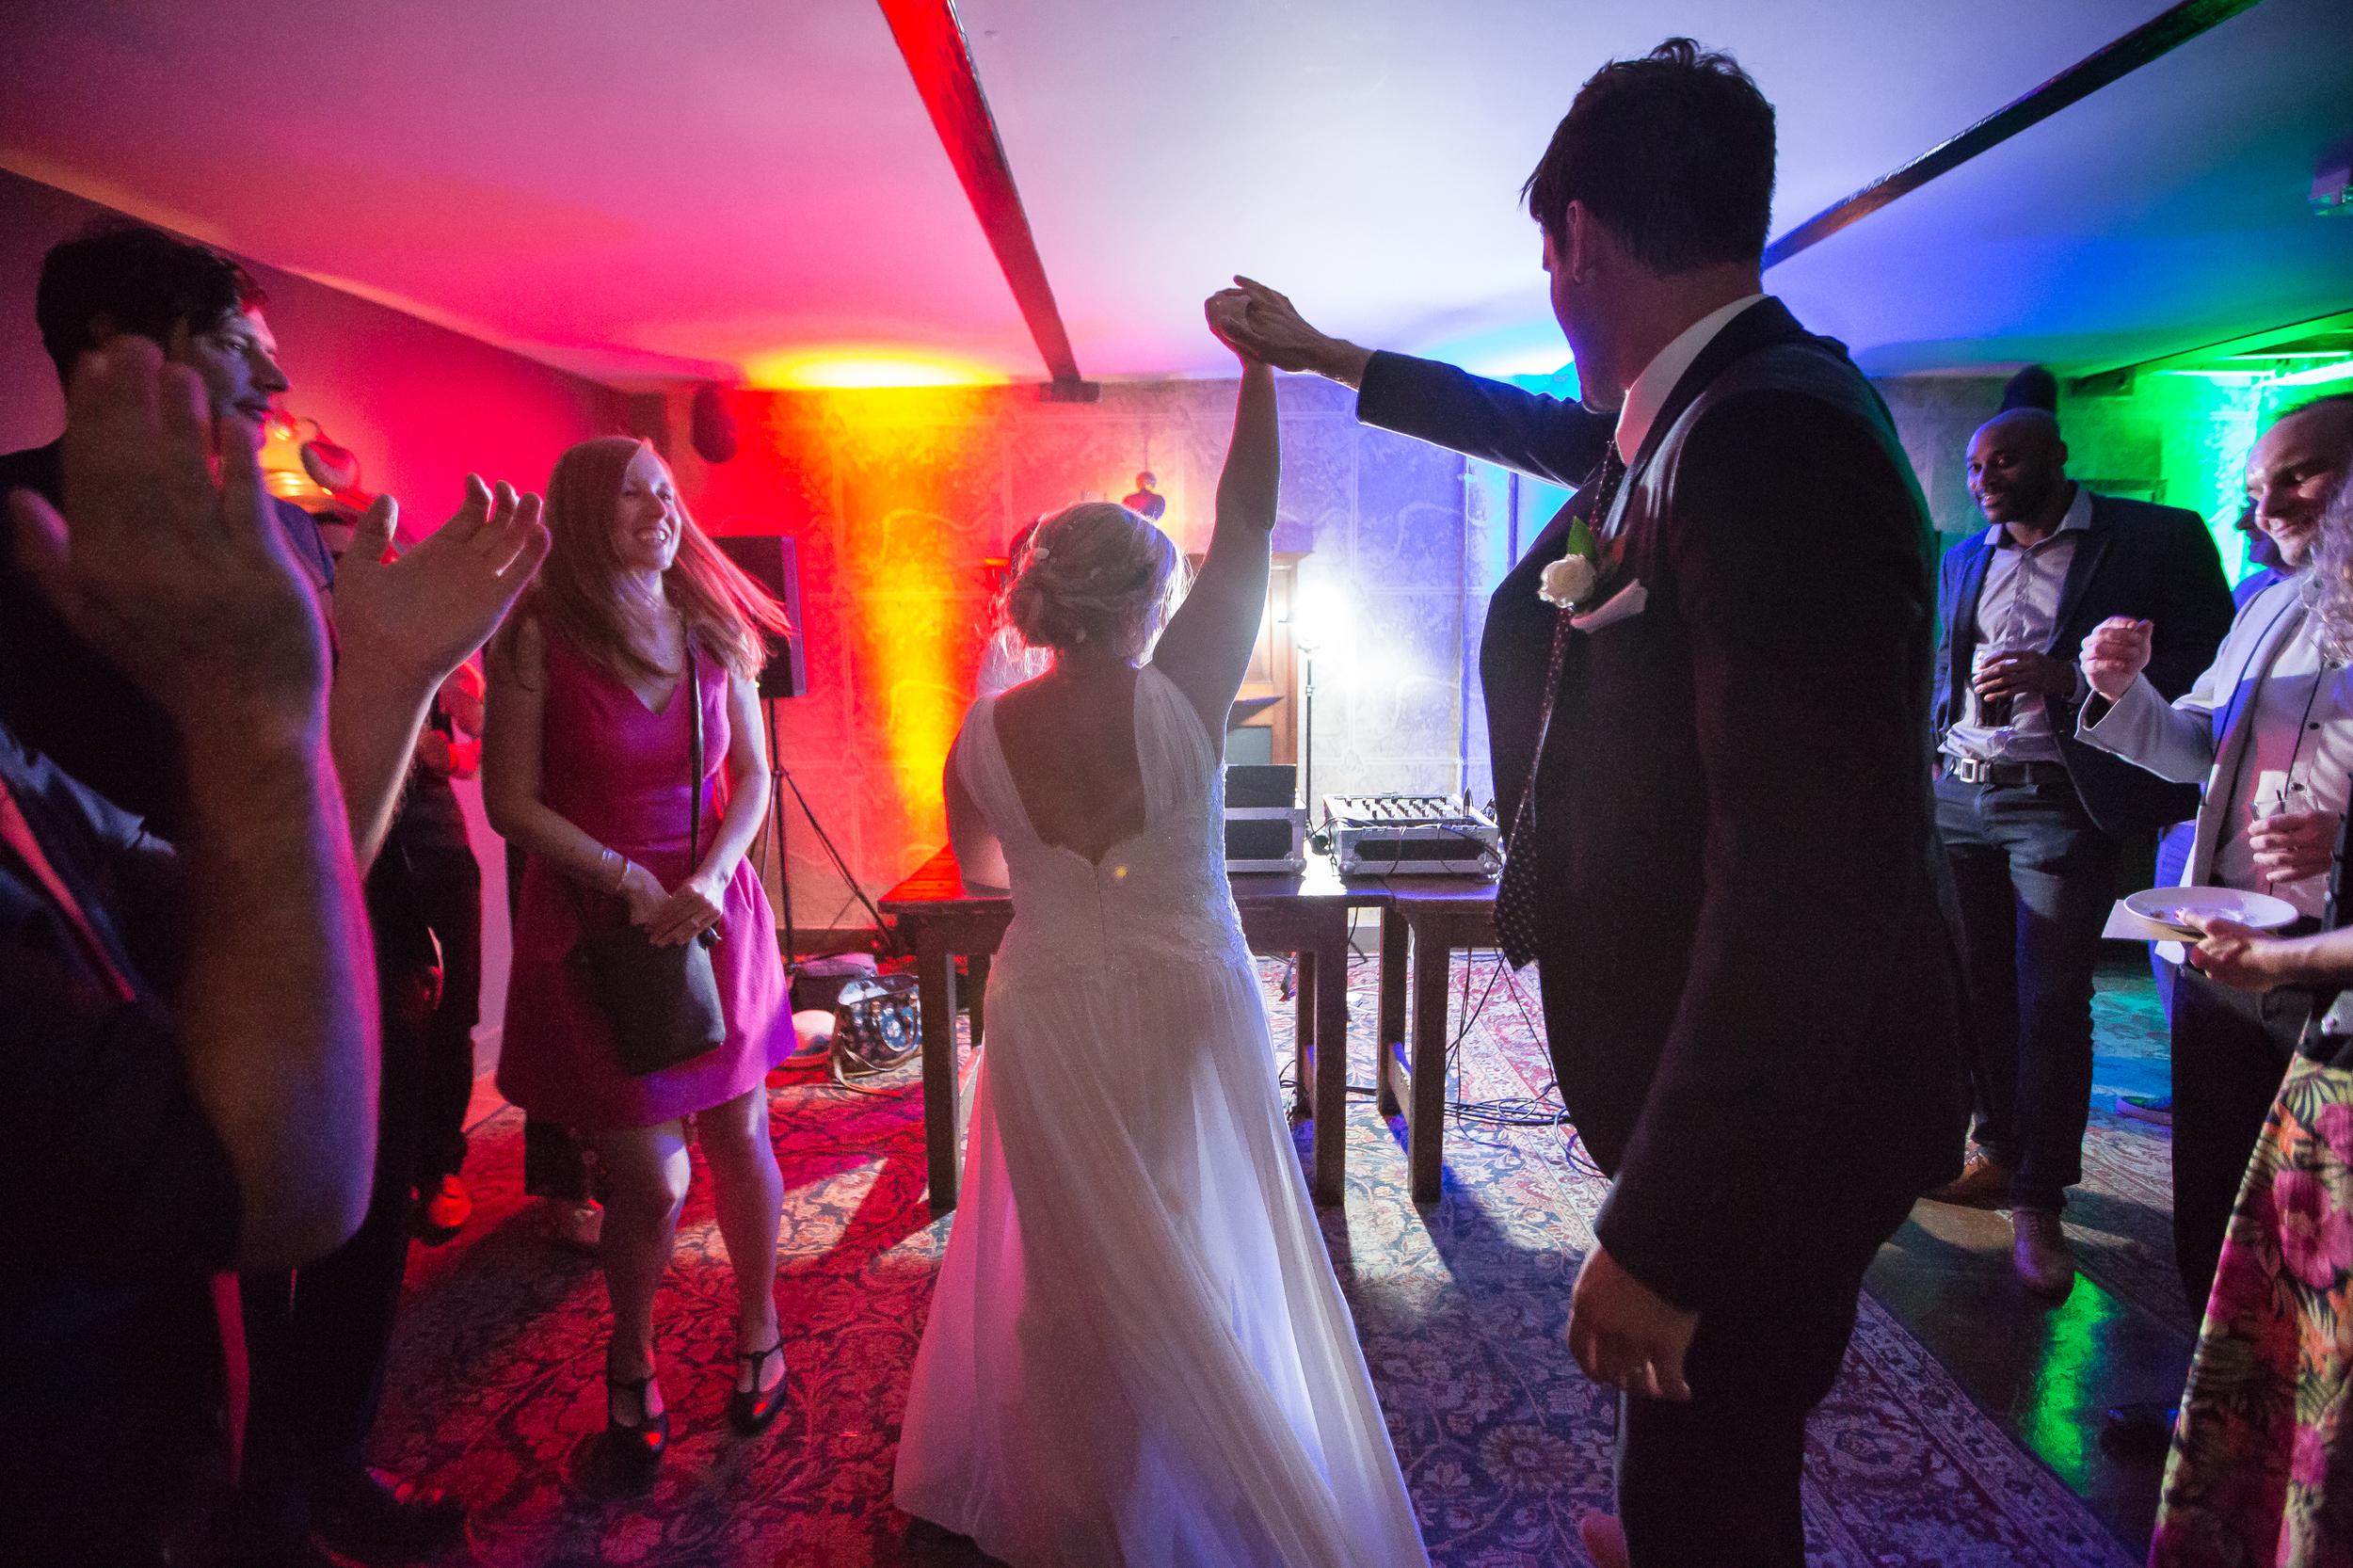 Artisan-Clerkenwell-wedding-reception-first-dance-1